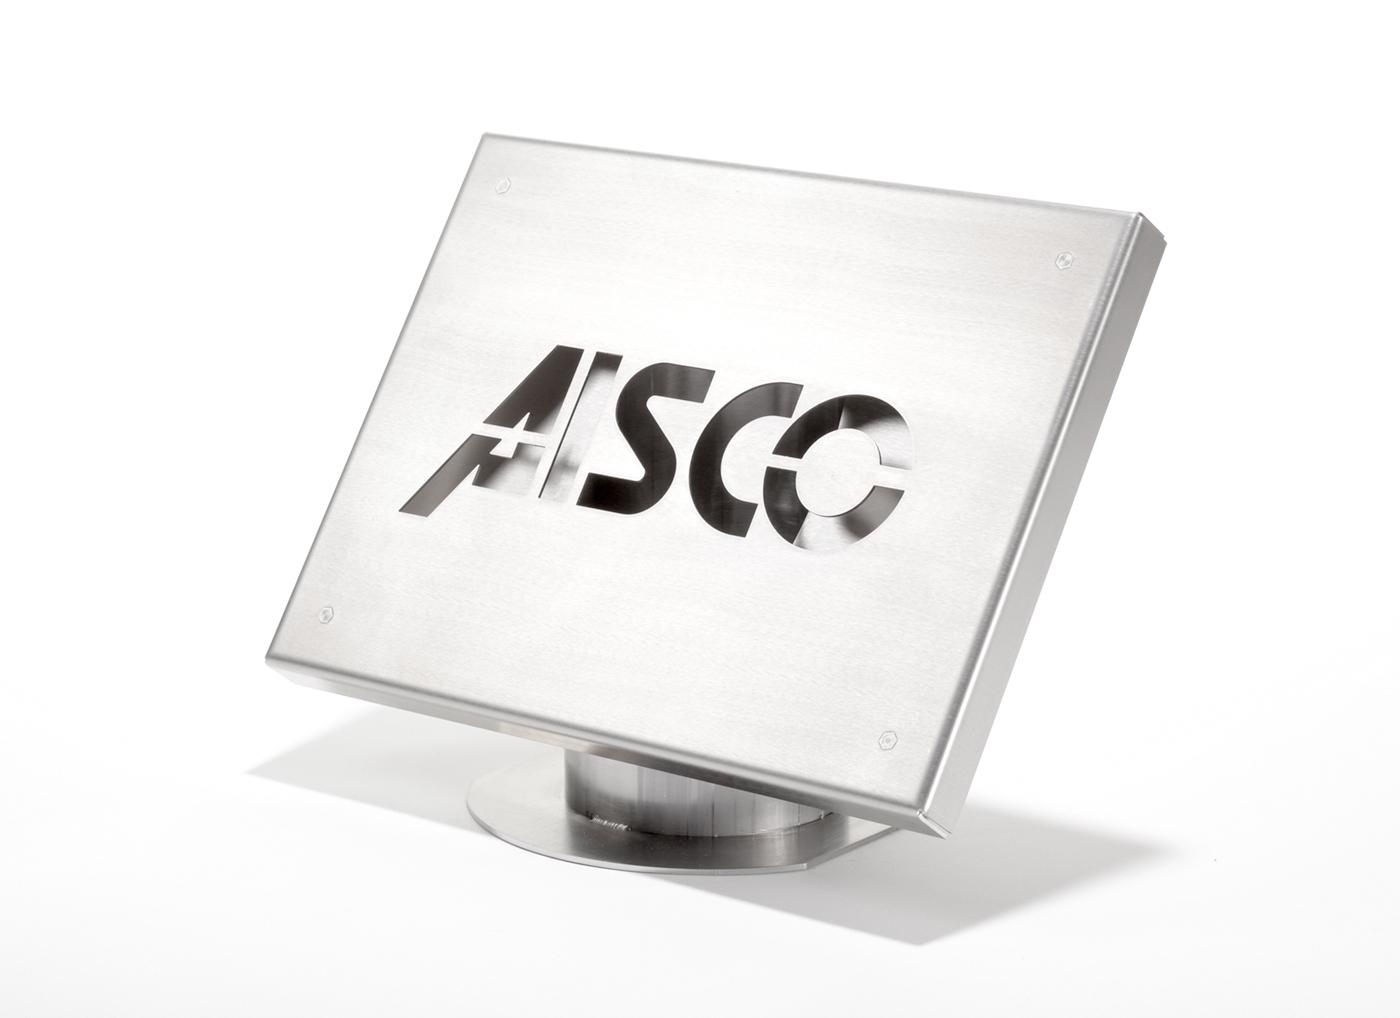 AISCO Firetrainer LCD